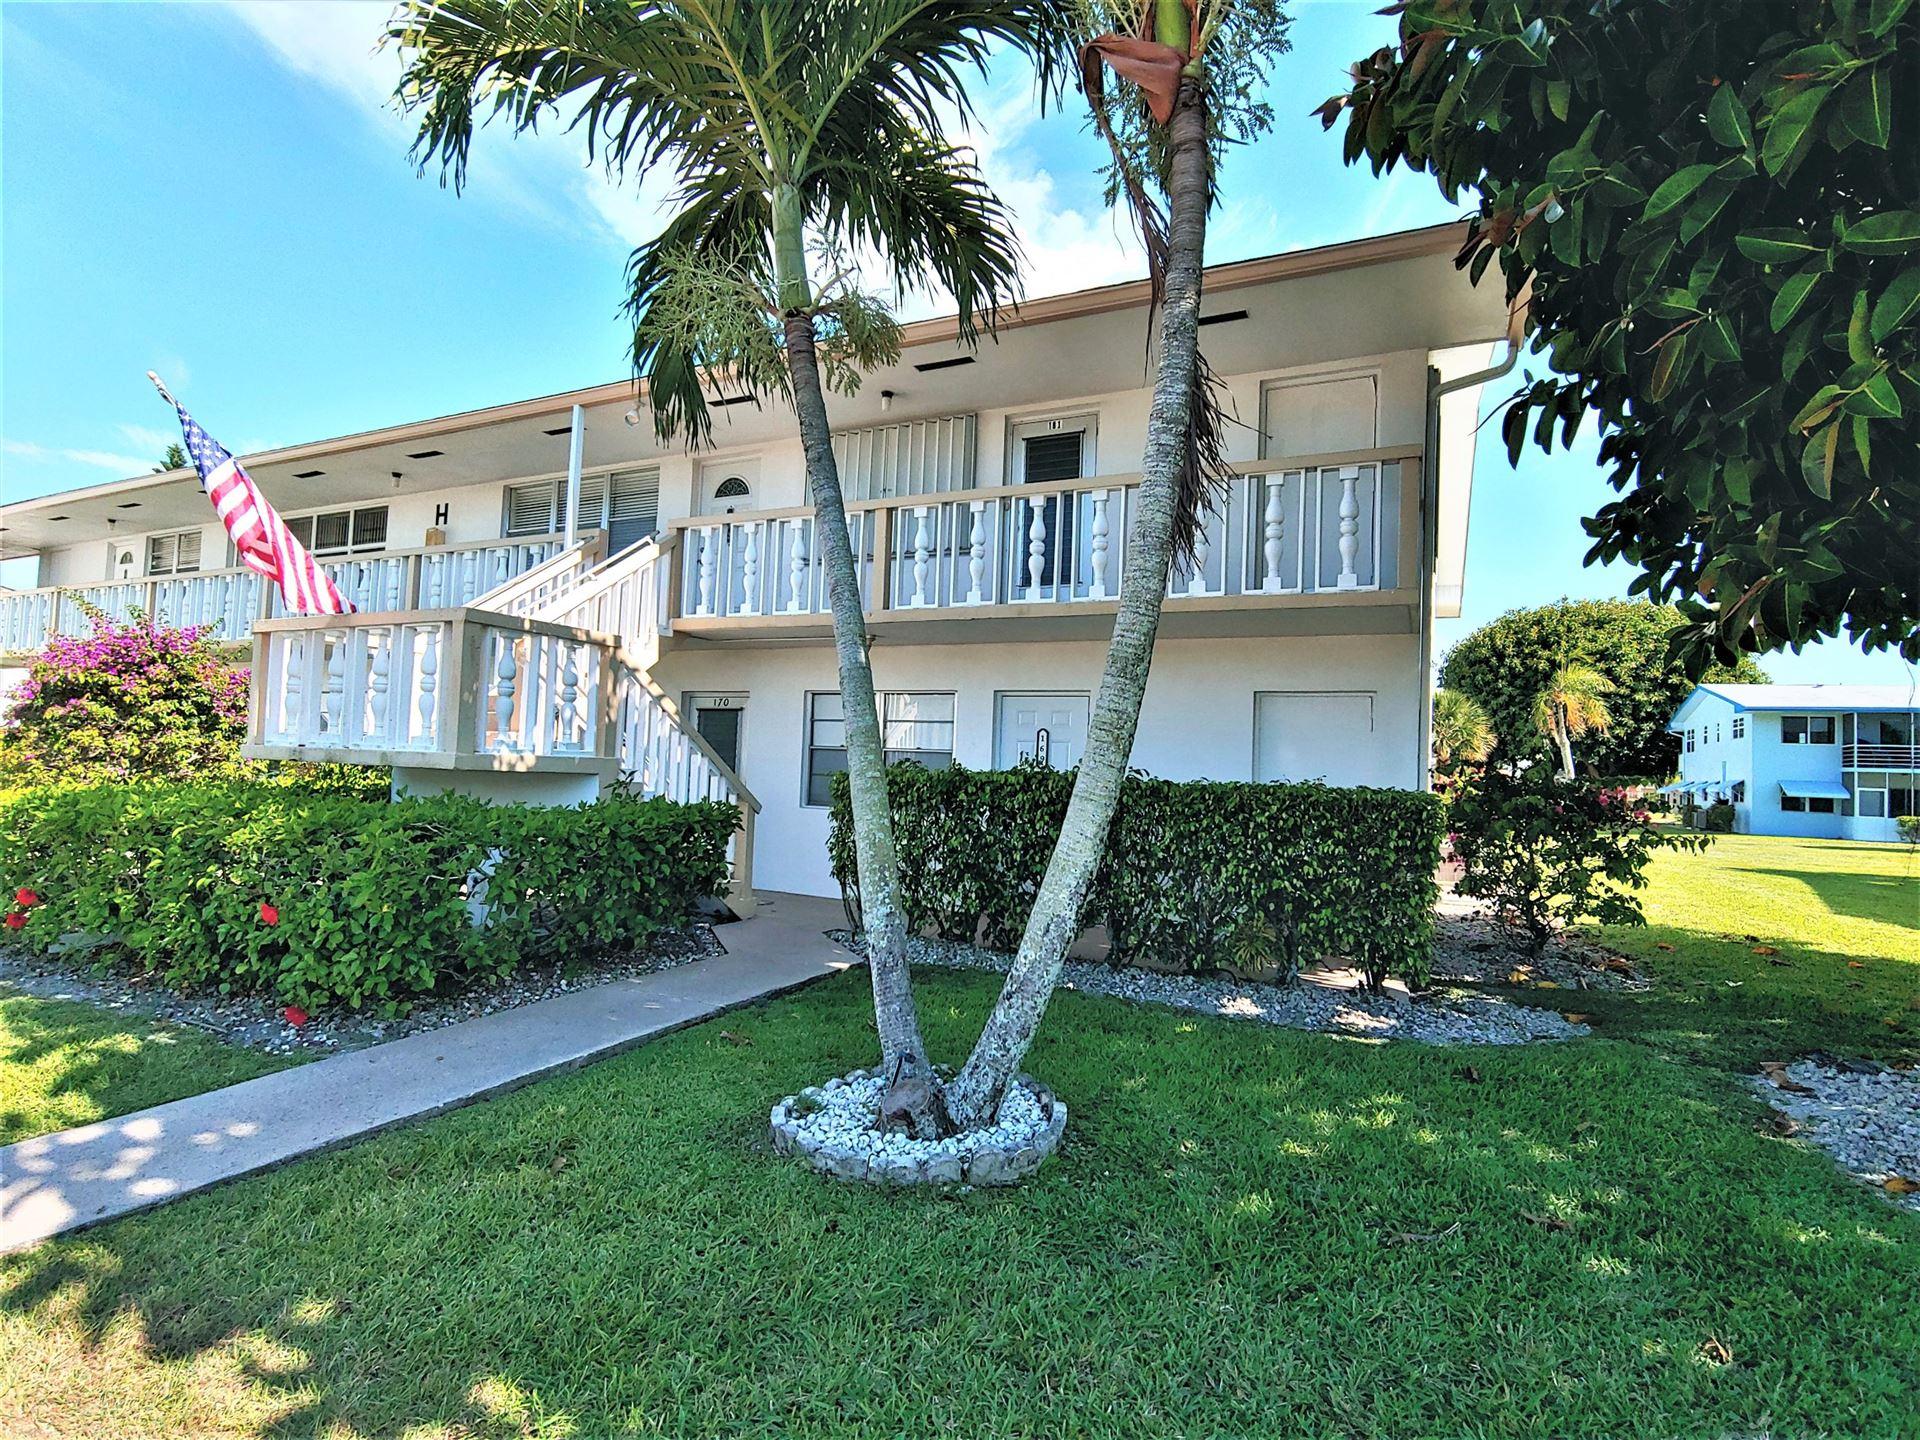 169 Easthampton #H, West Palm Beach, FL 33417 - MLS#: RX-10719898